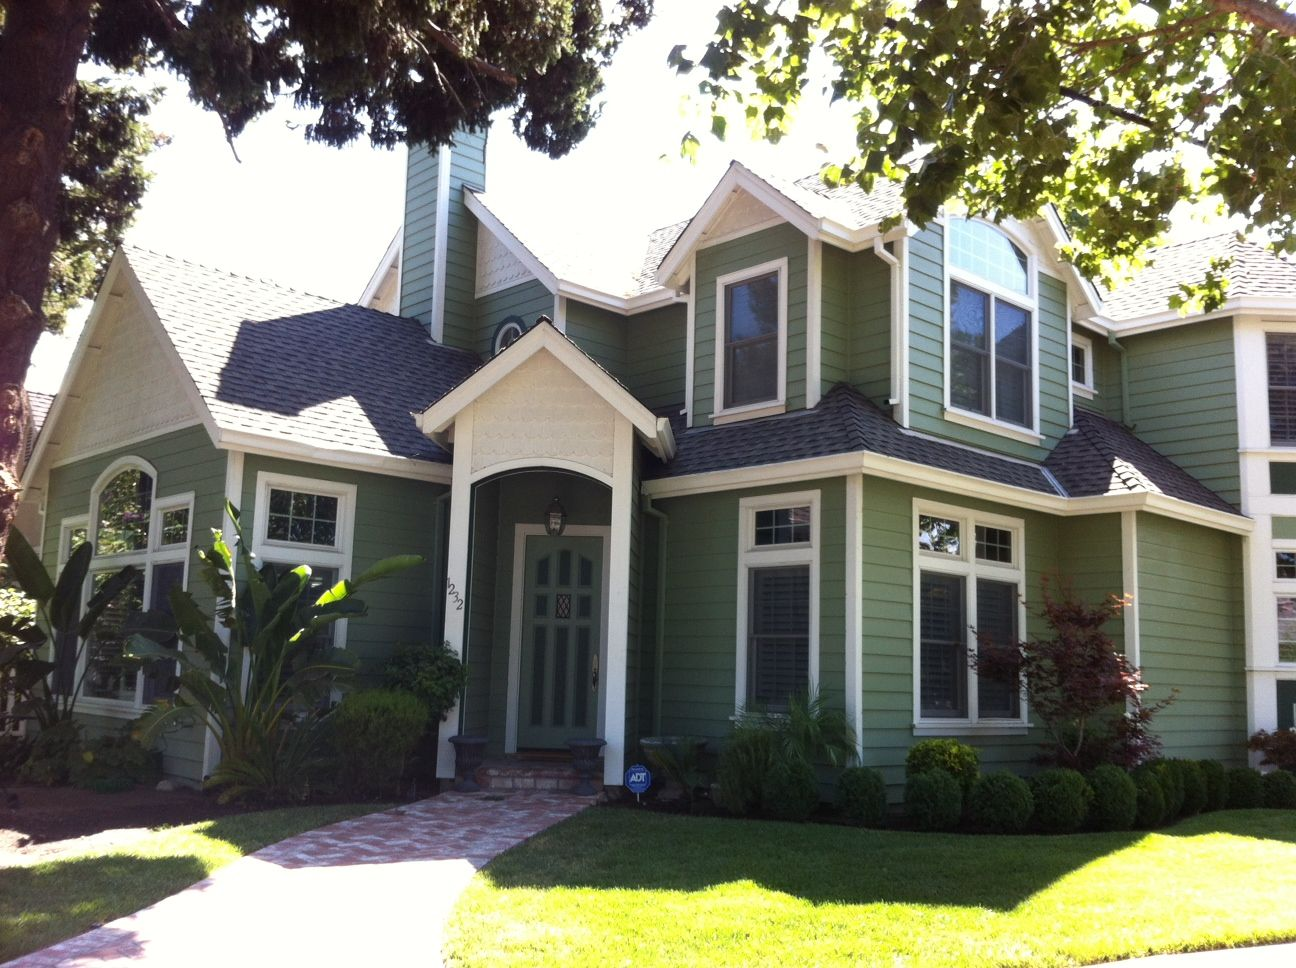 Extreme Makeover Flowers Edition Exterior House Paint Well It S Green House Paint Exterior House Exterior Color Schemes Craftsman Home Exterior